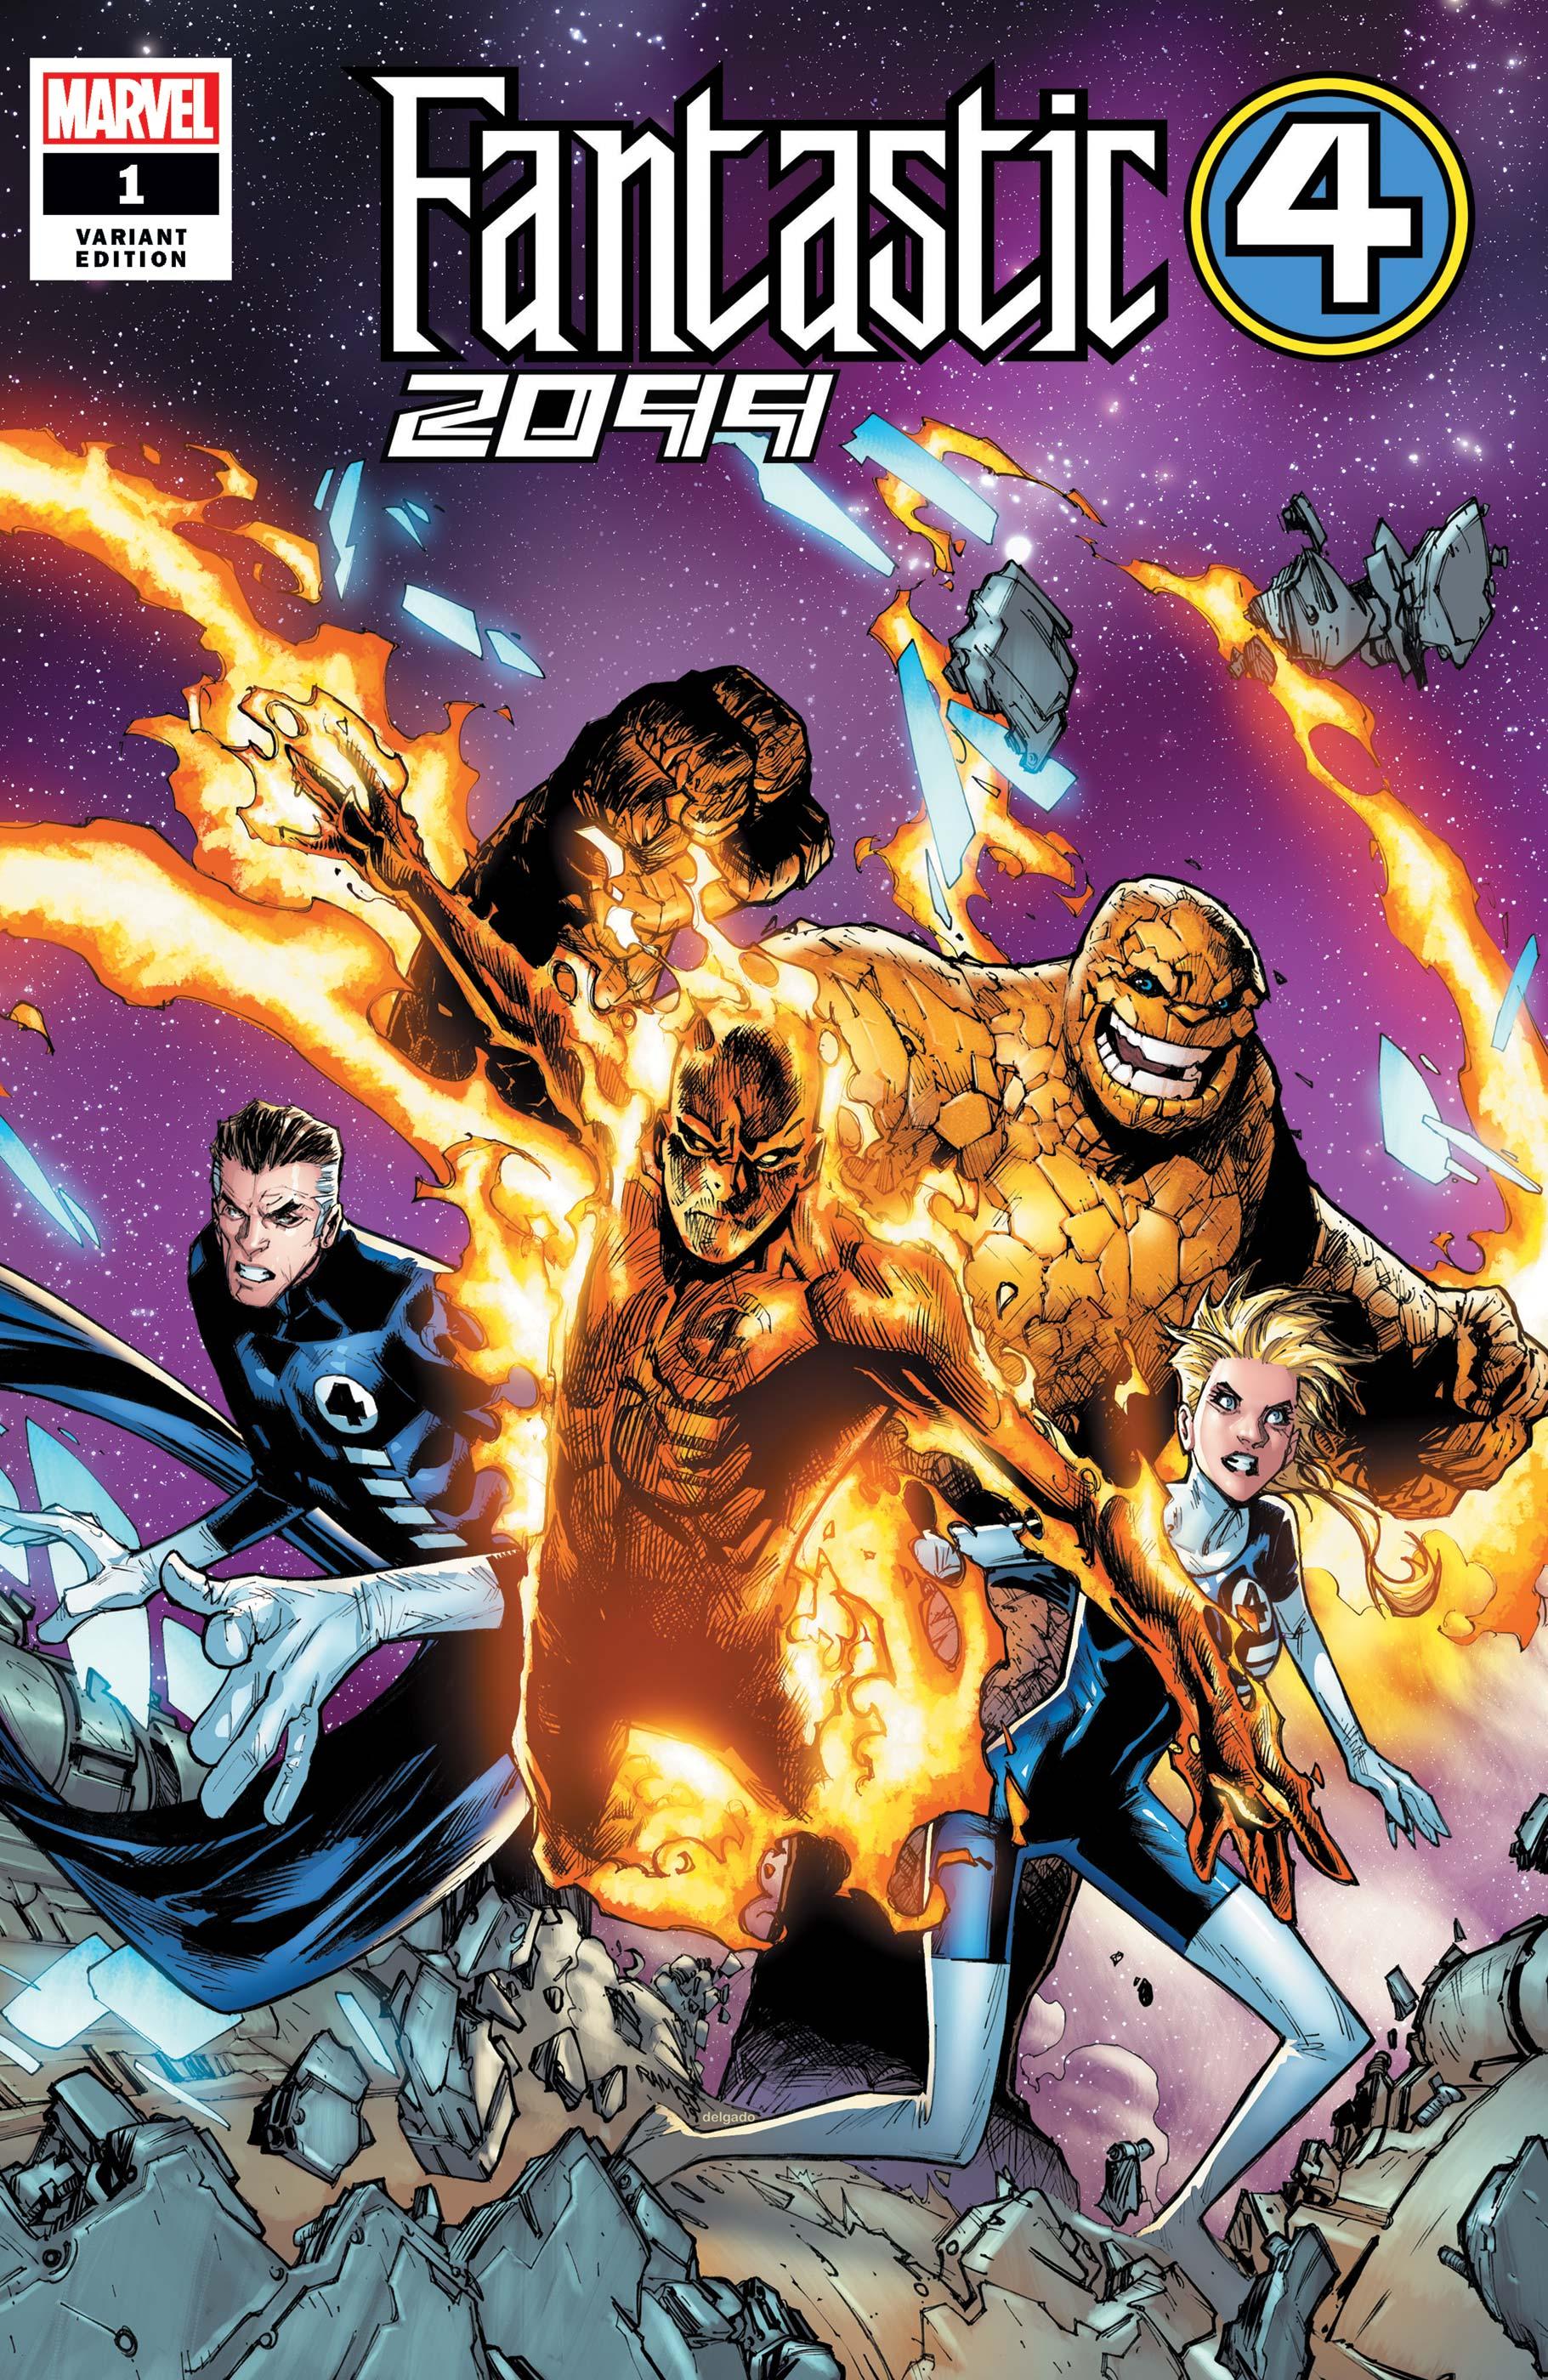 Fantastic Four 2099 (2019) #1 (Variant)